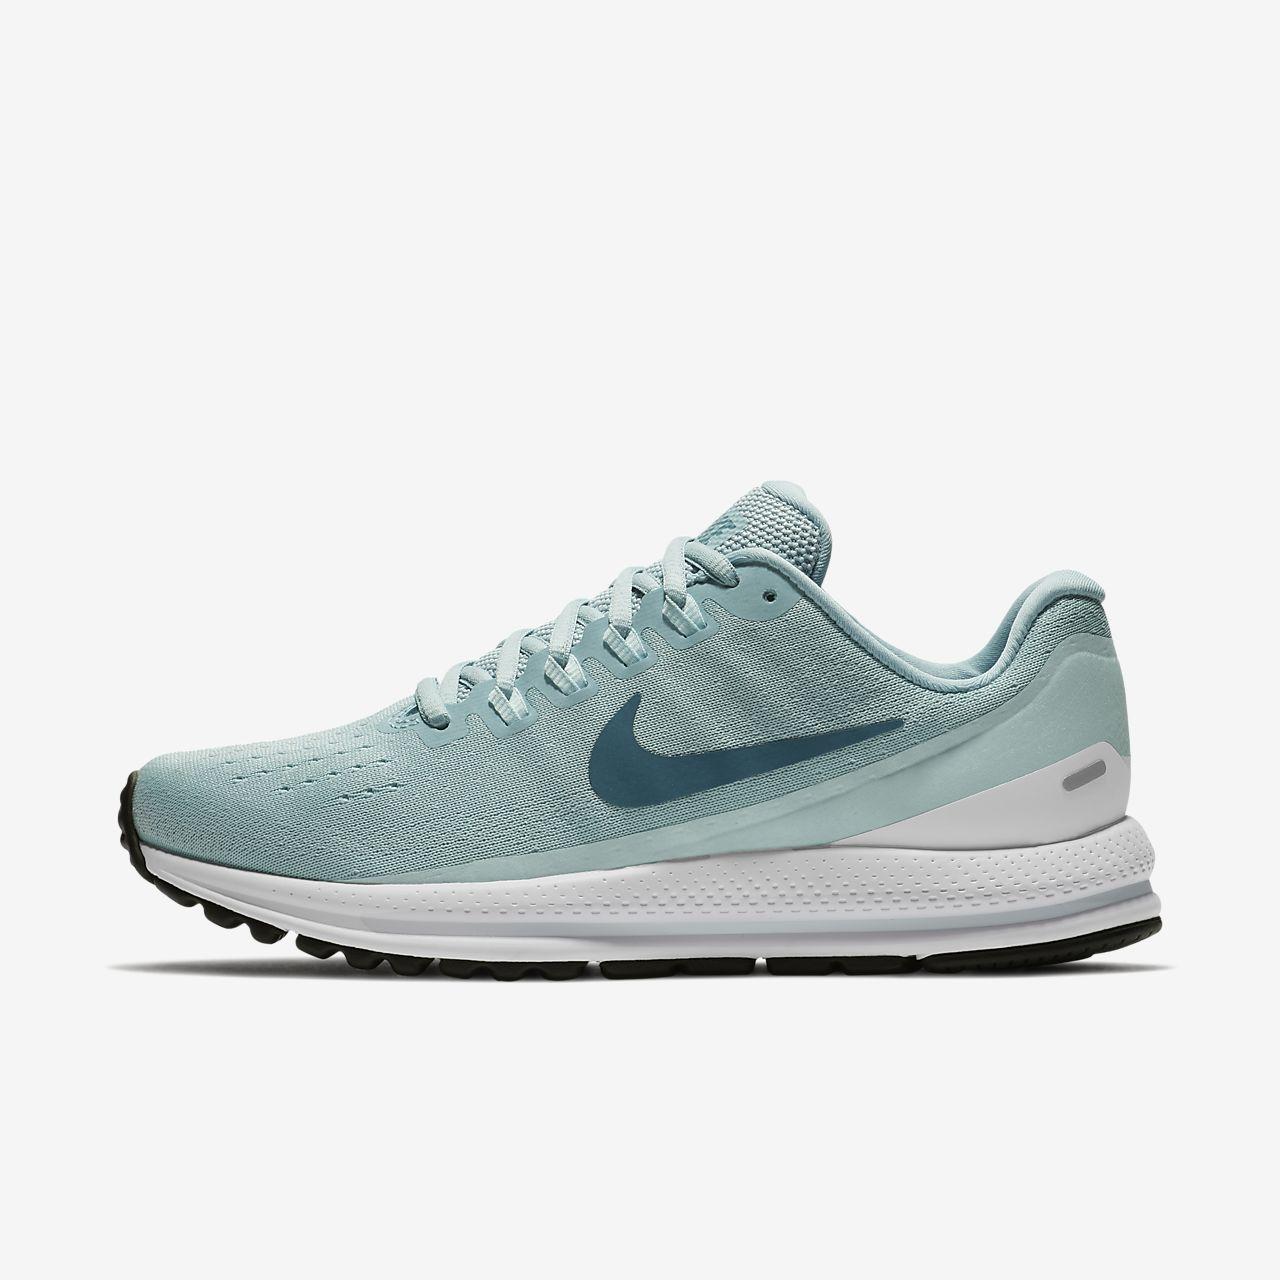 ... Nike Air Zoom Vomero 13 Damen-Laufschuh